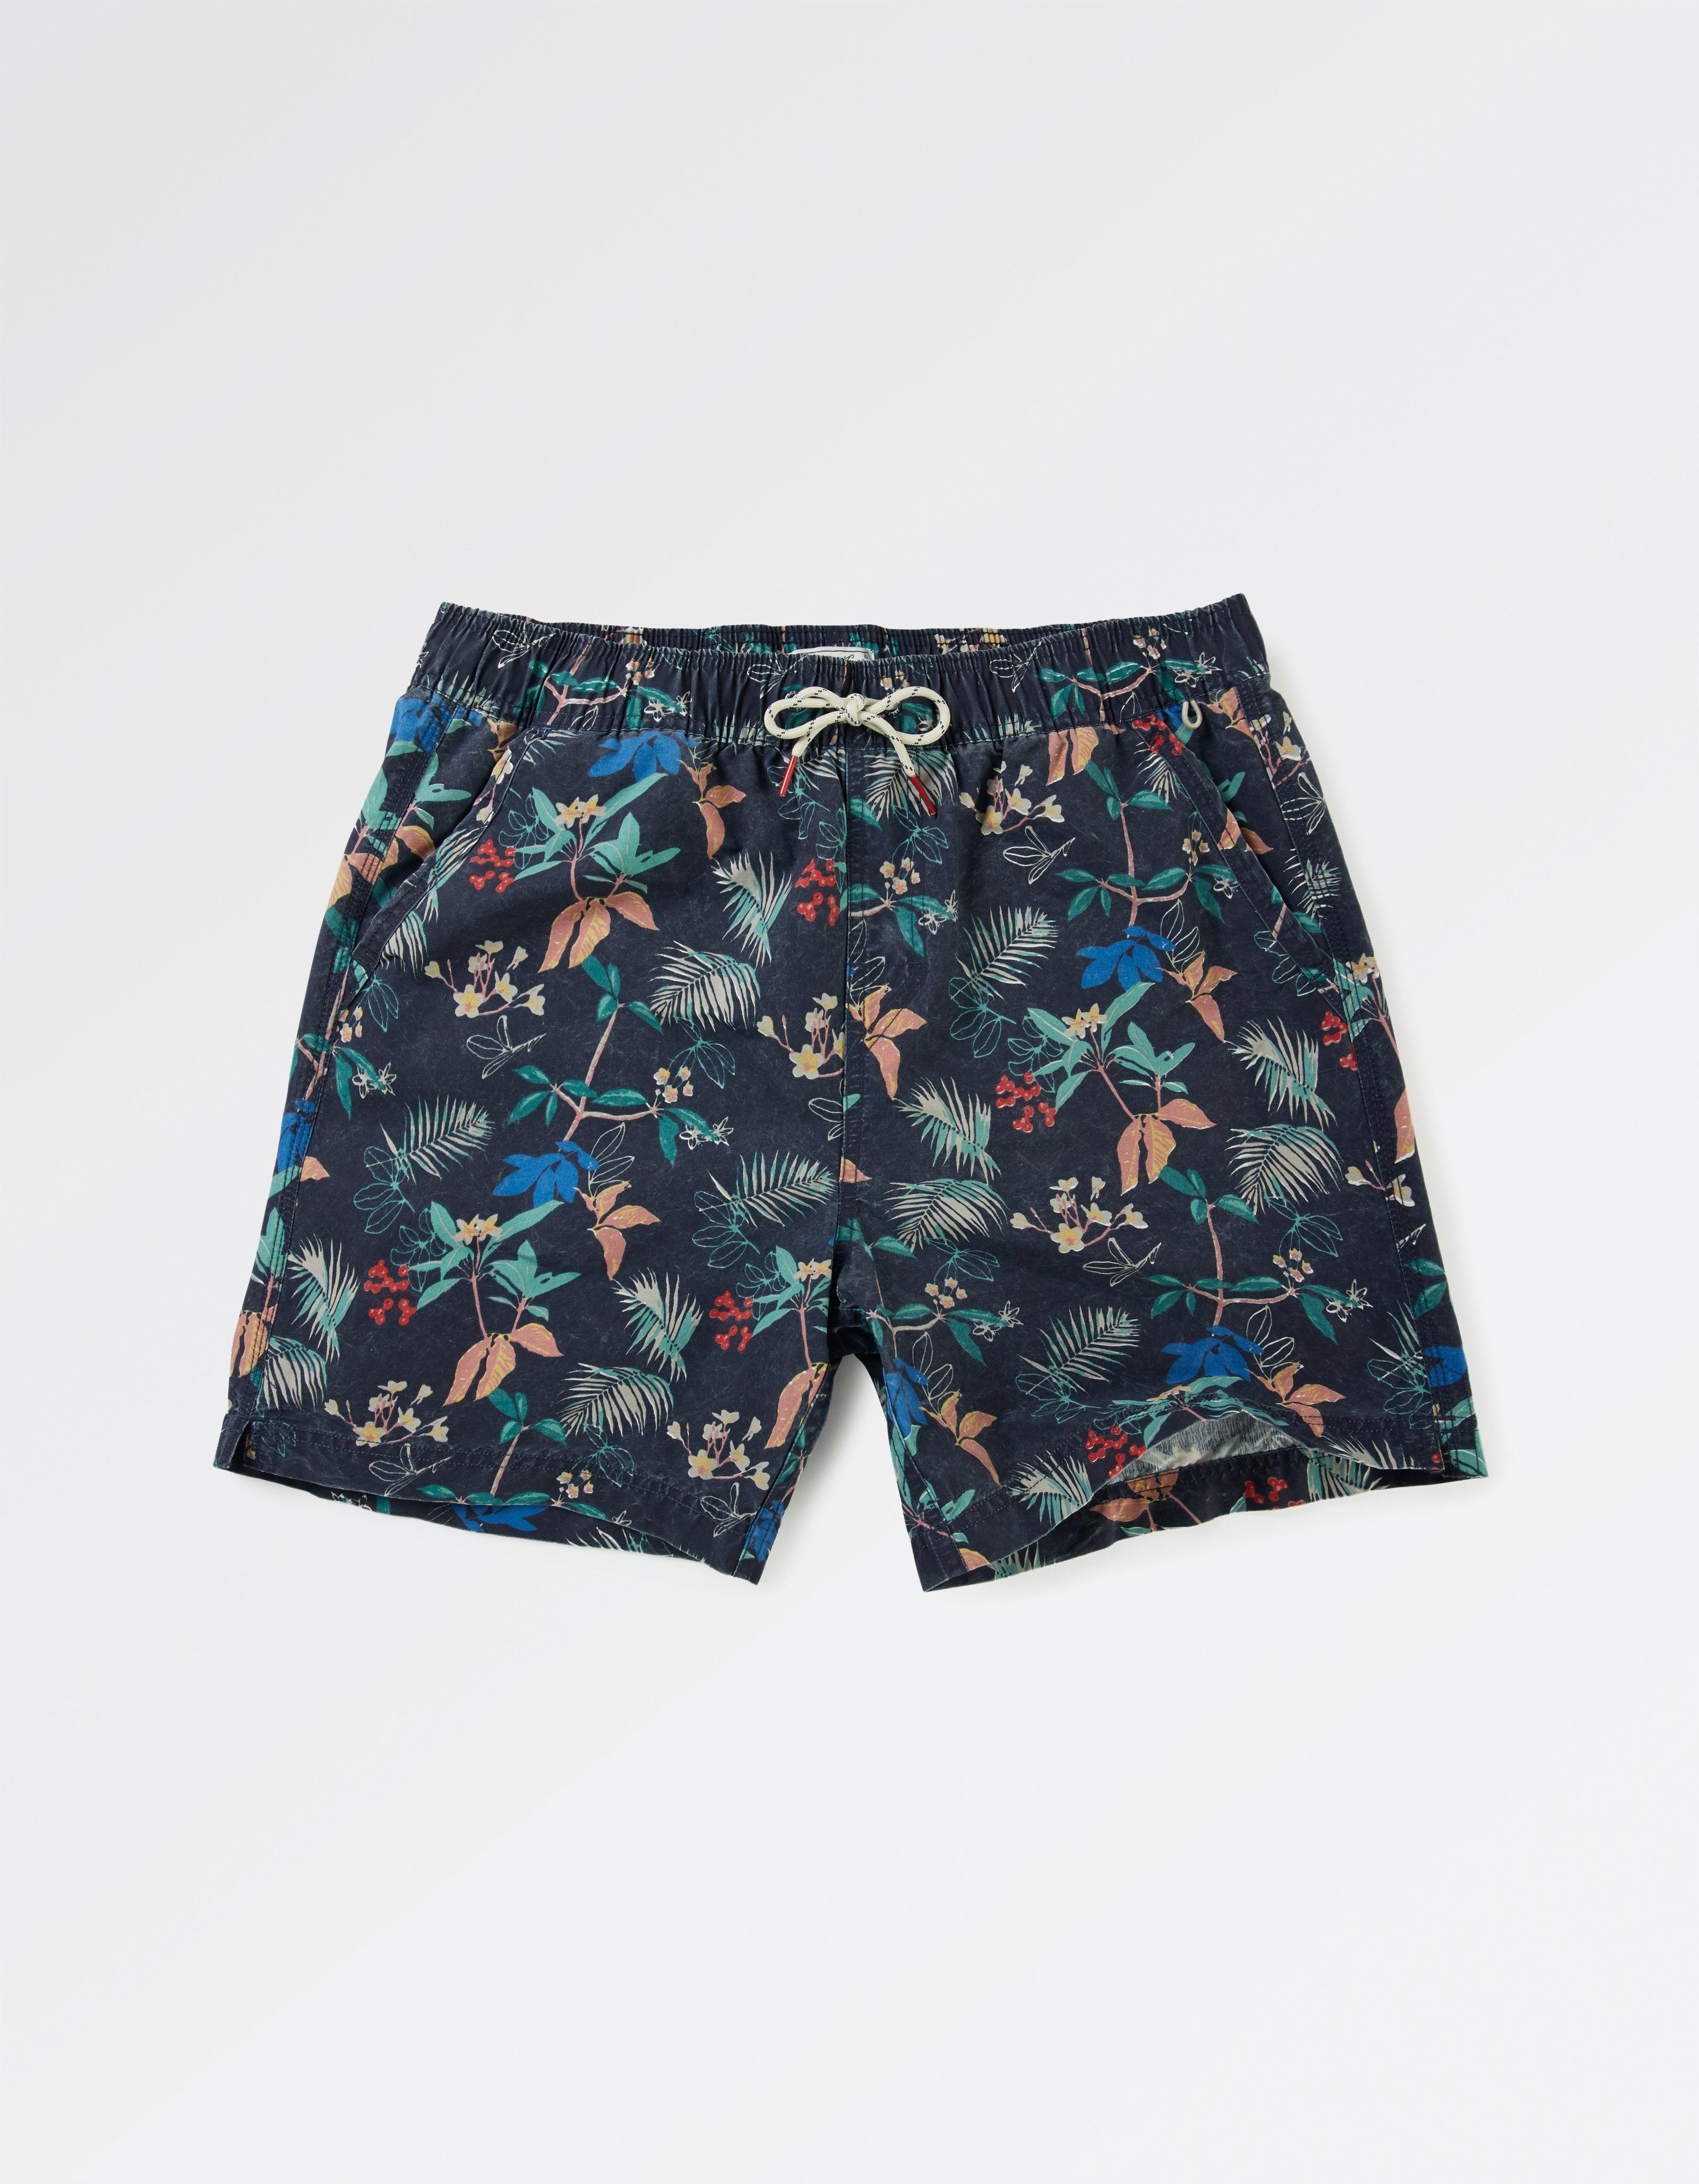 Fistral Tropical Print Swim Shorts